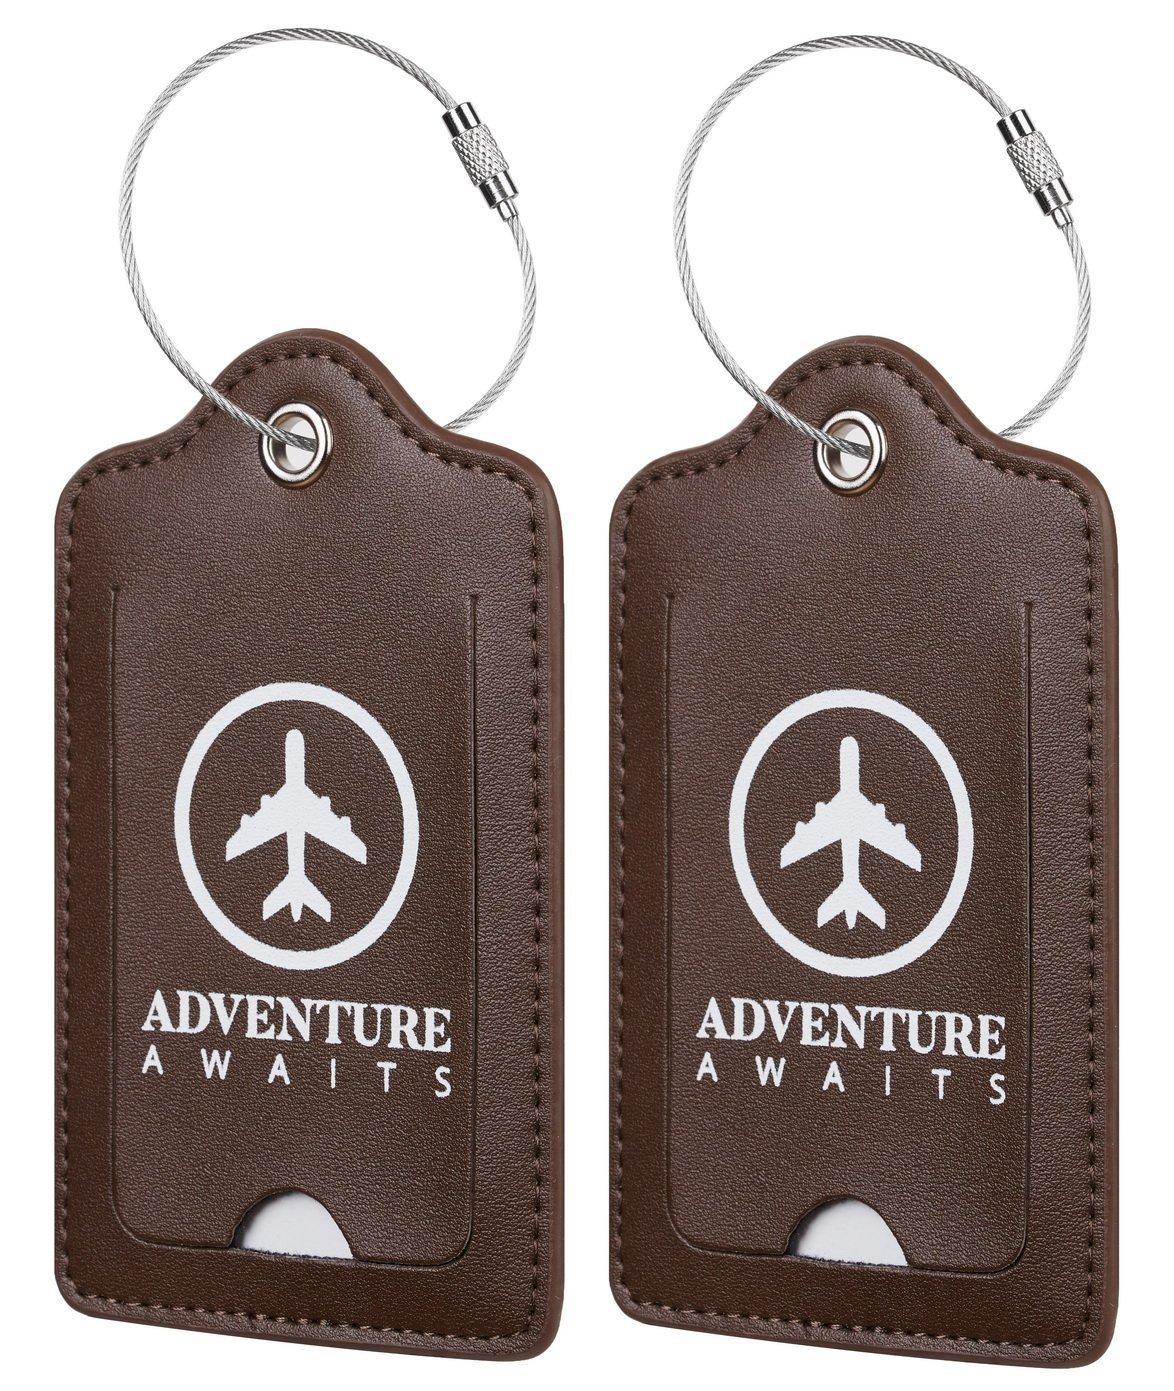 Chelmon Leather Luggage Tags Baggage Bag Instrument Tag 2 Pcs Set (Coffee coffee 8051)